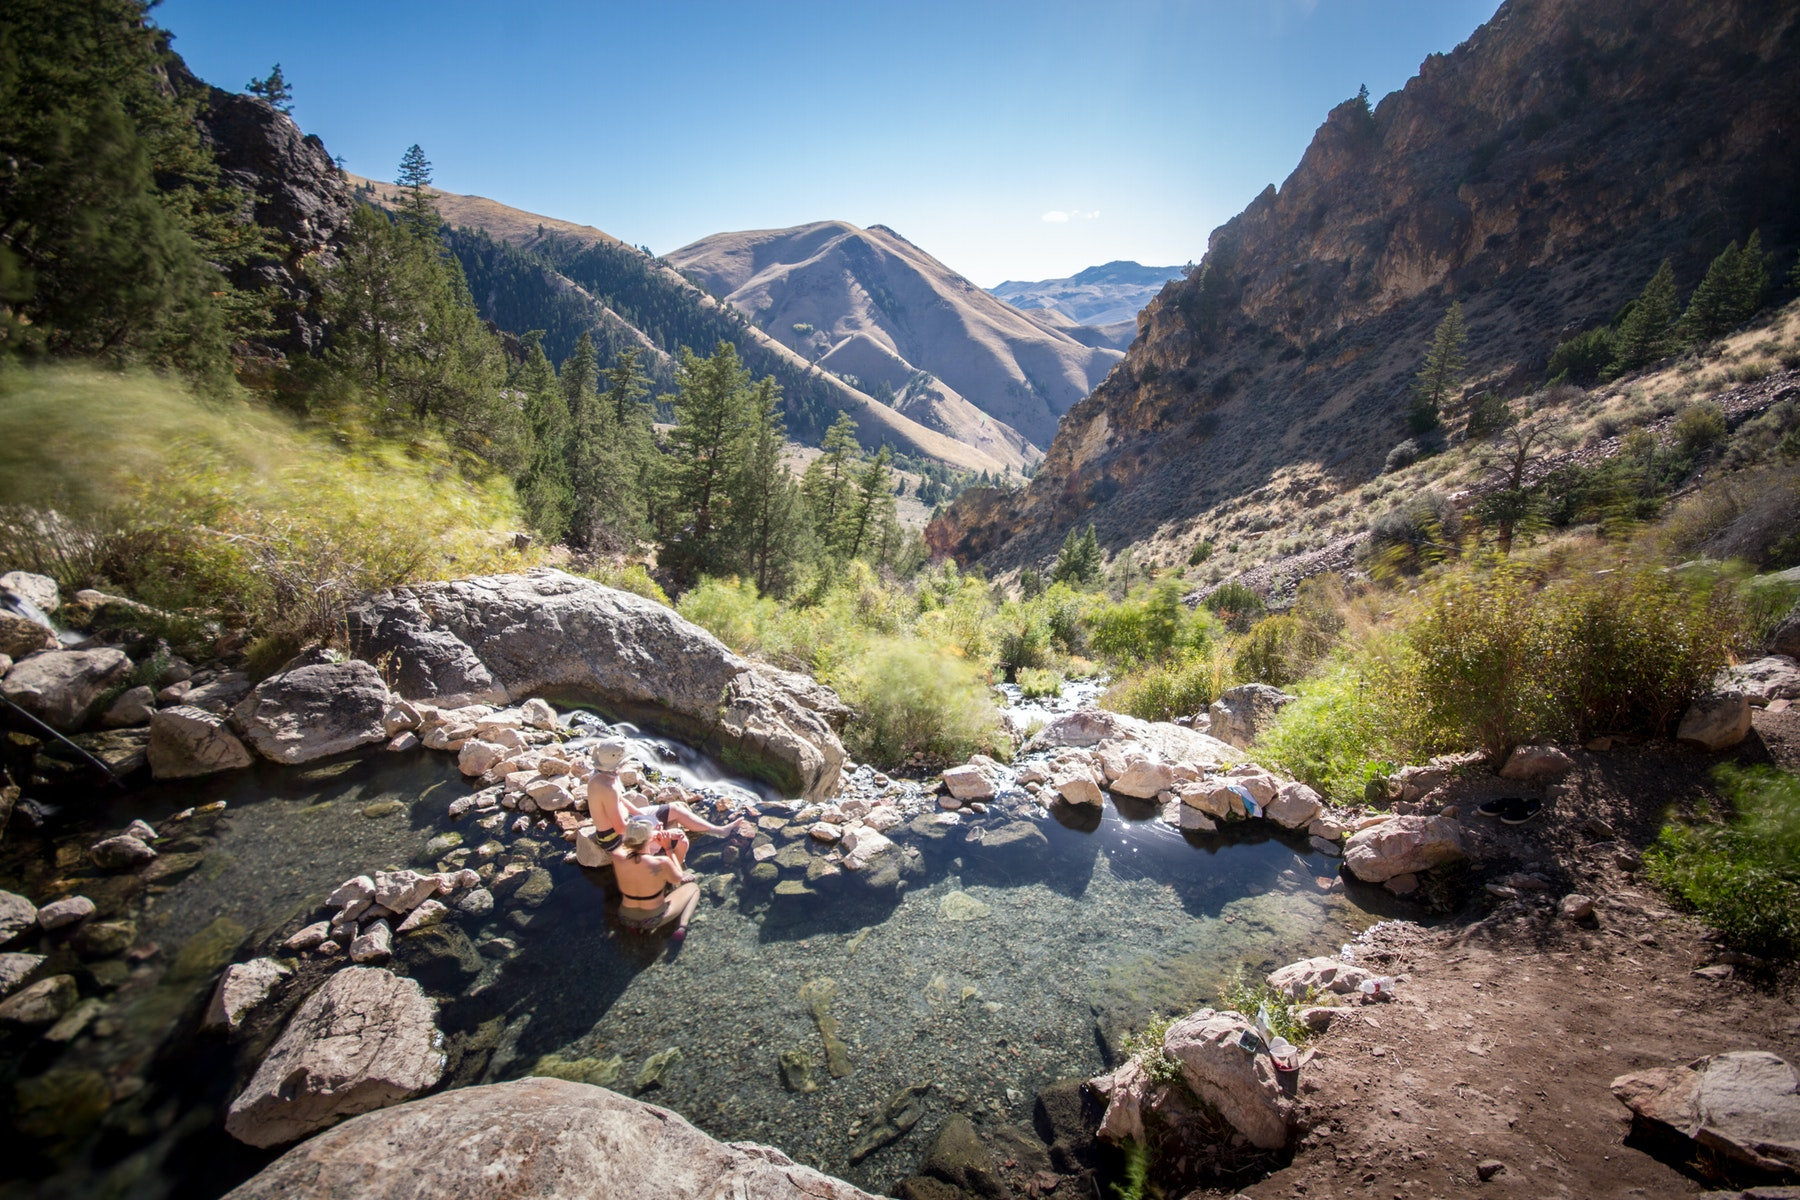 Hike & Soak in Goldbug Hot Springs, Goldbug Hot Springs